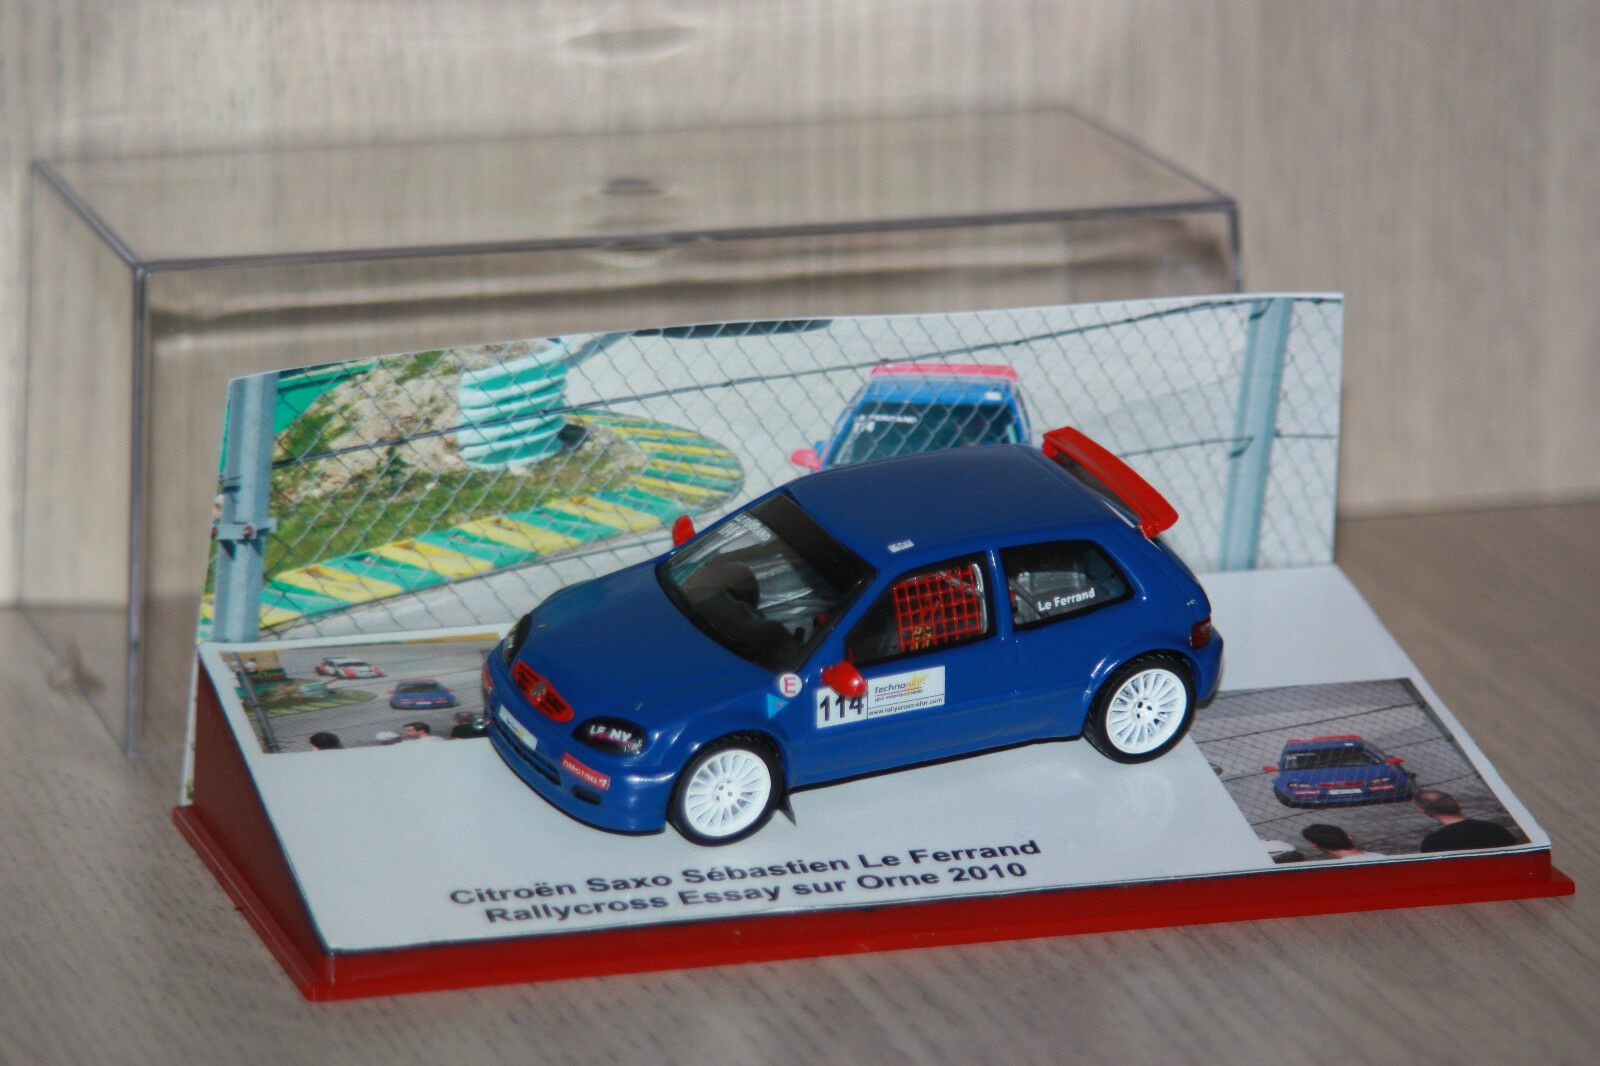 Citroën Saxo  Kit Car  D1A Le Ferrand Rallycross Essay s  Orne 2010 e